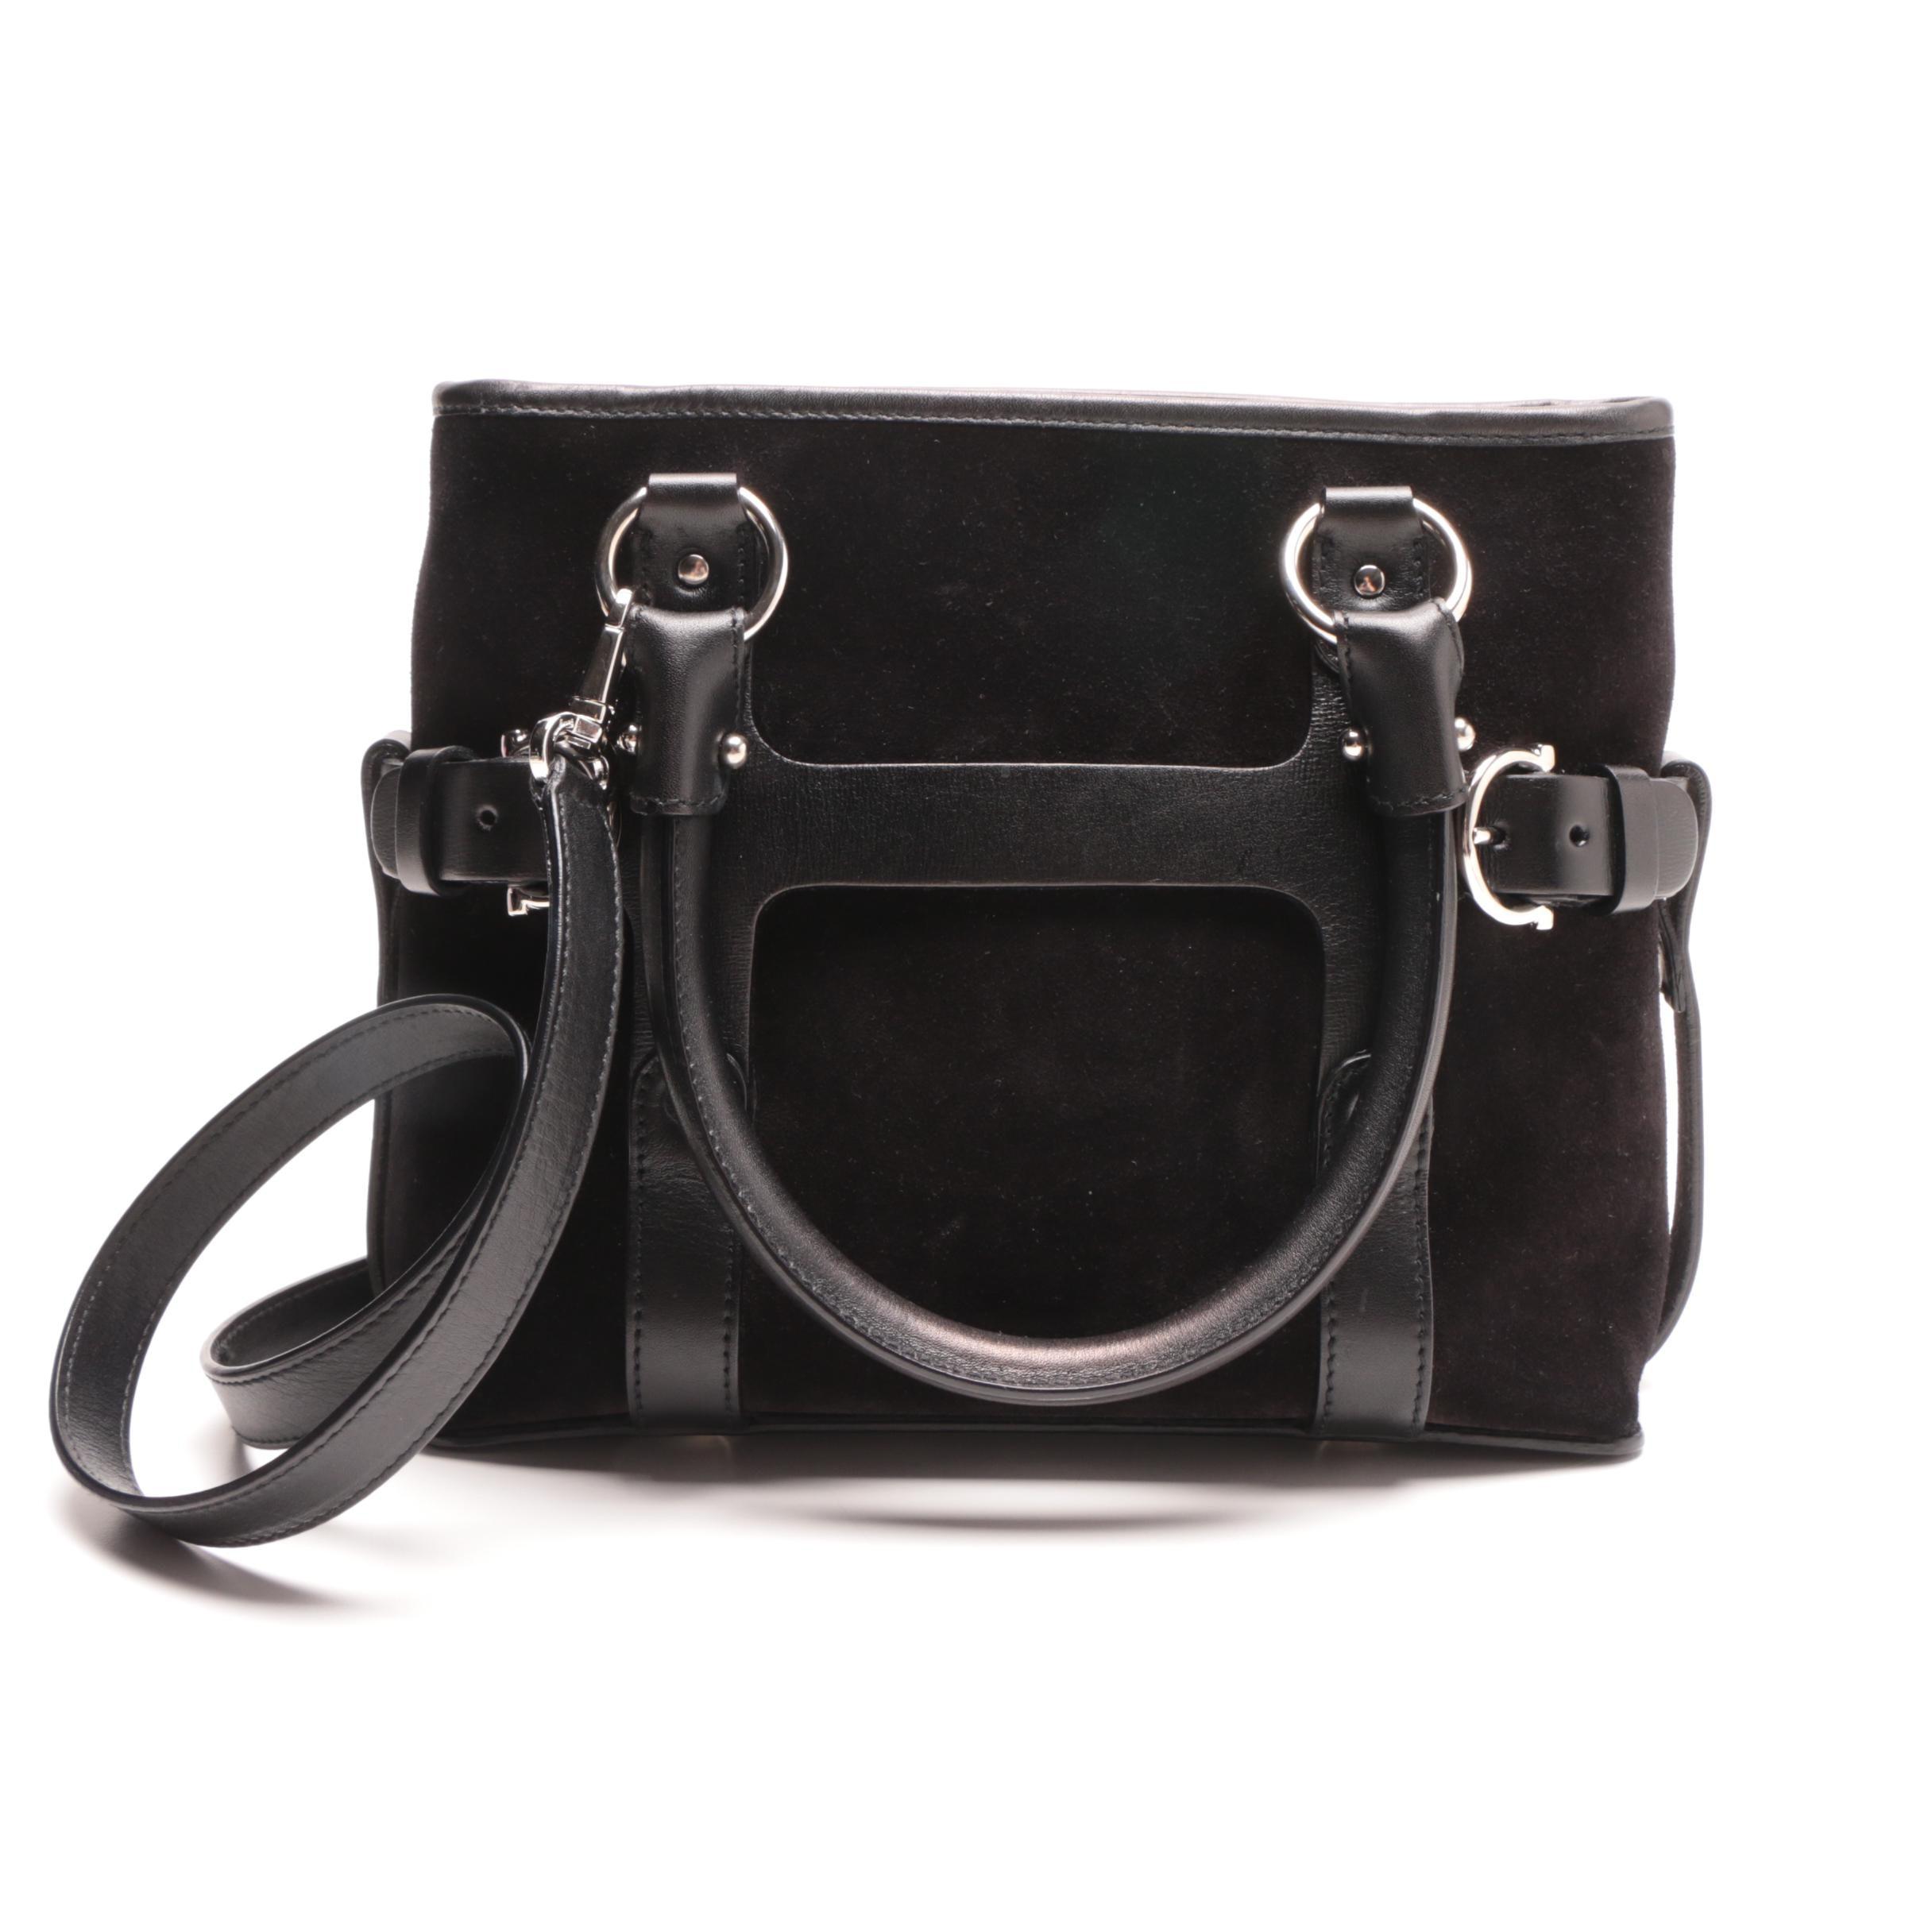 Salvatore Ferragamo Black Suede and Leather Handbag